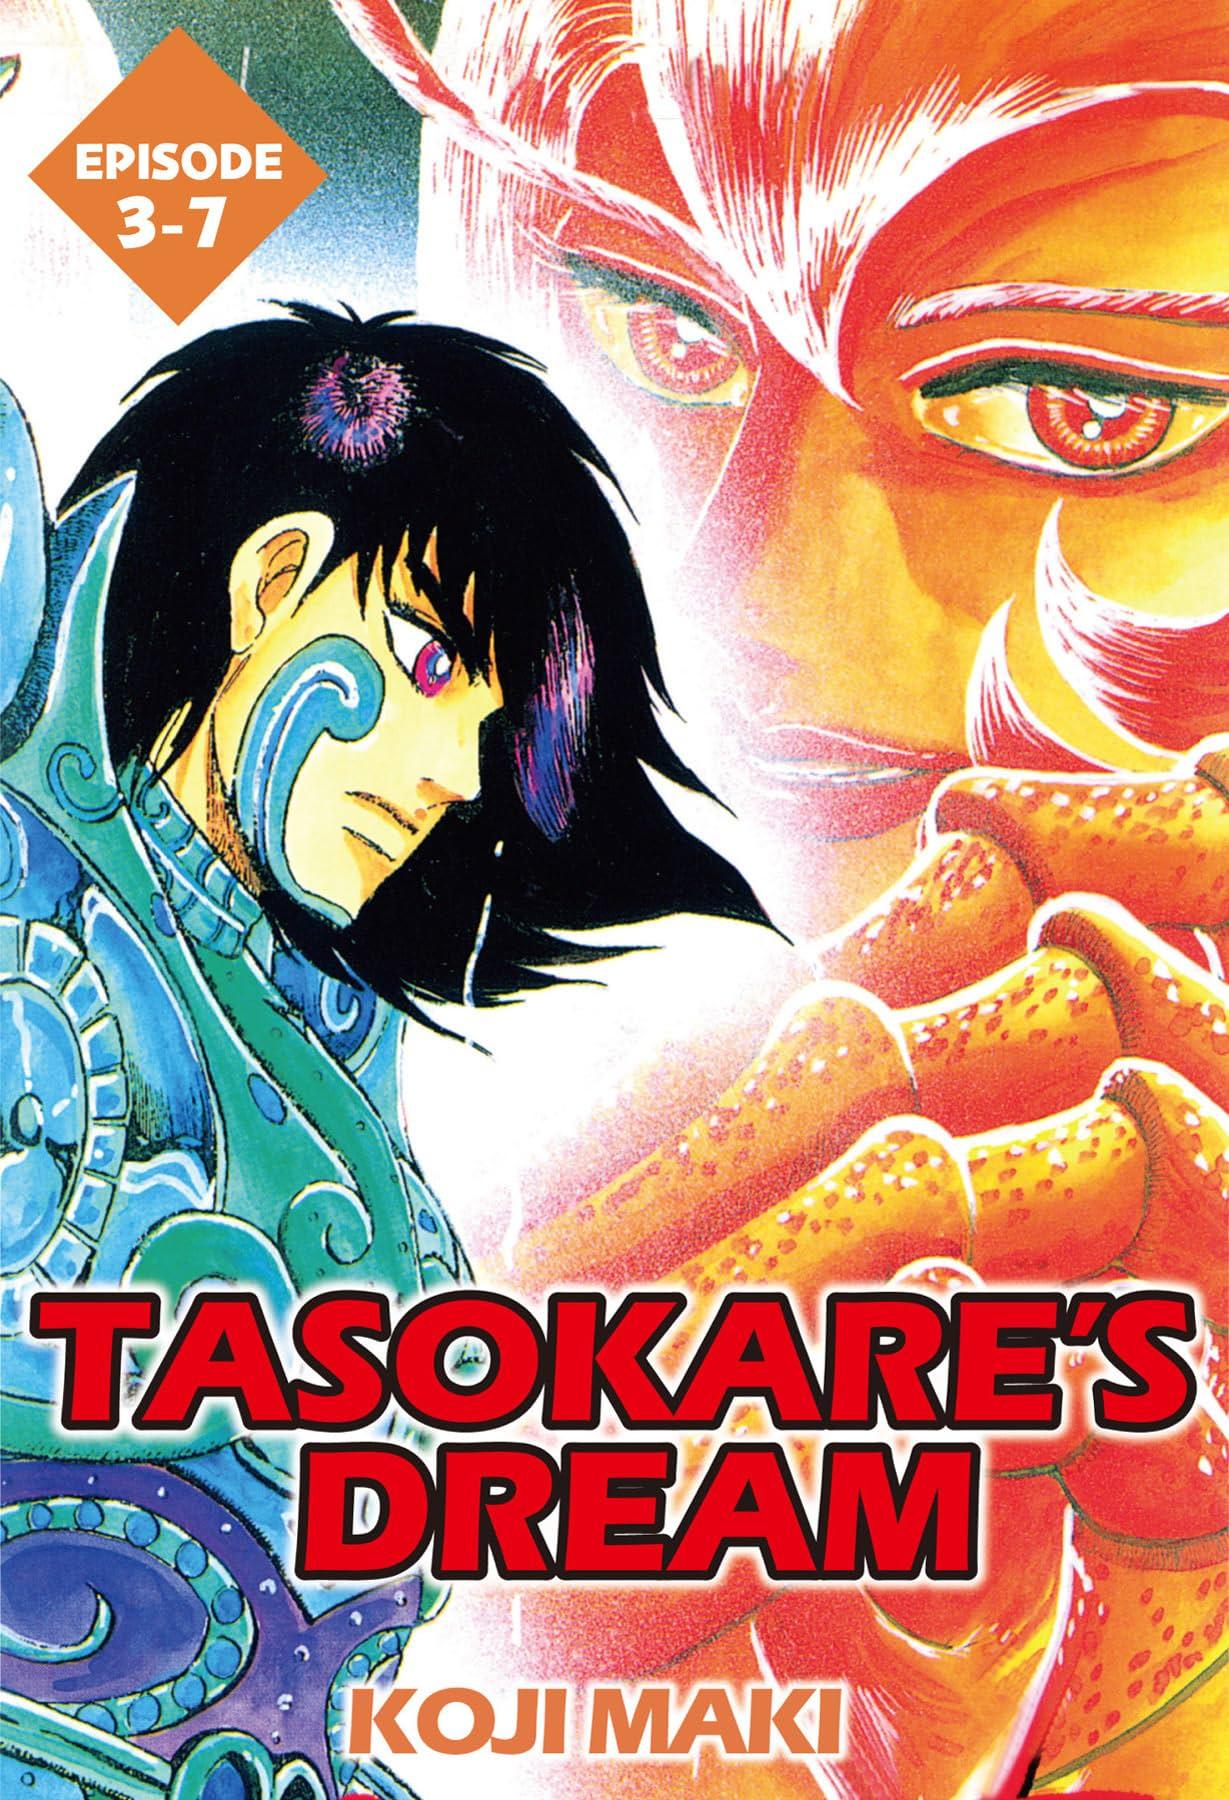 TASOKARE'S DREAM #21